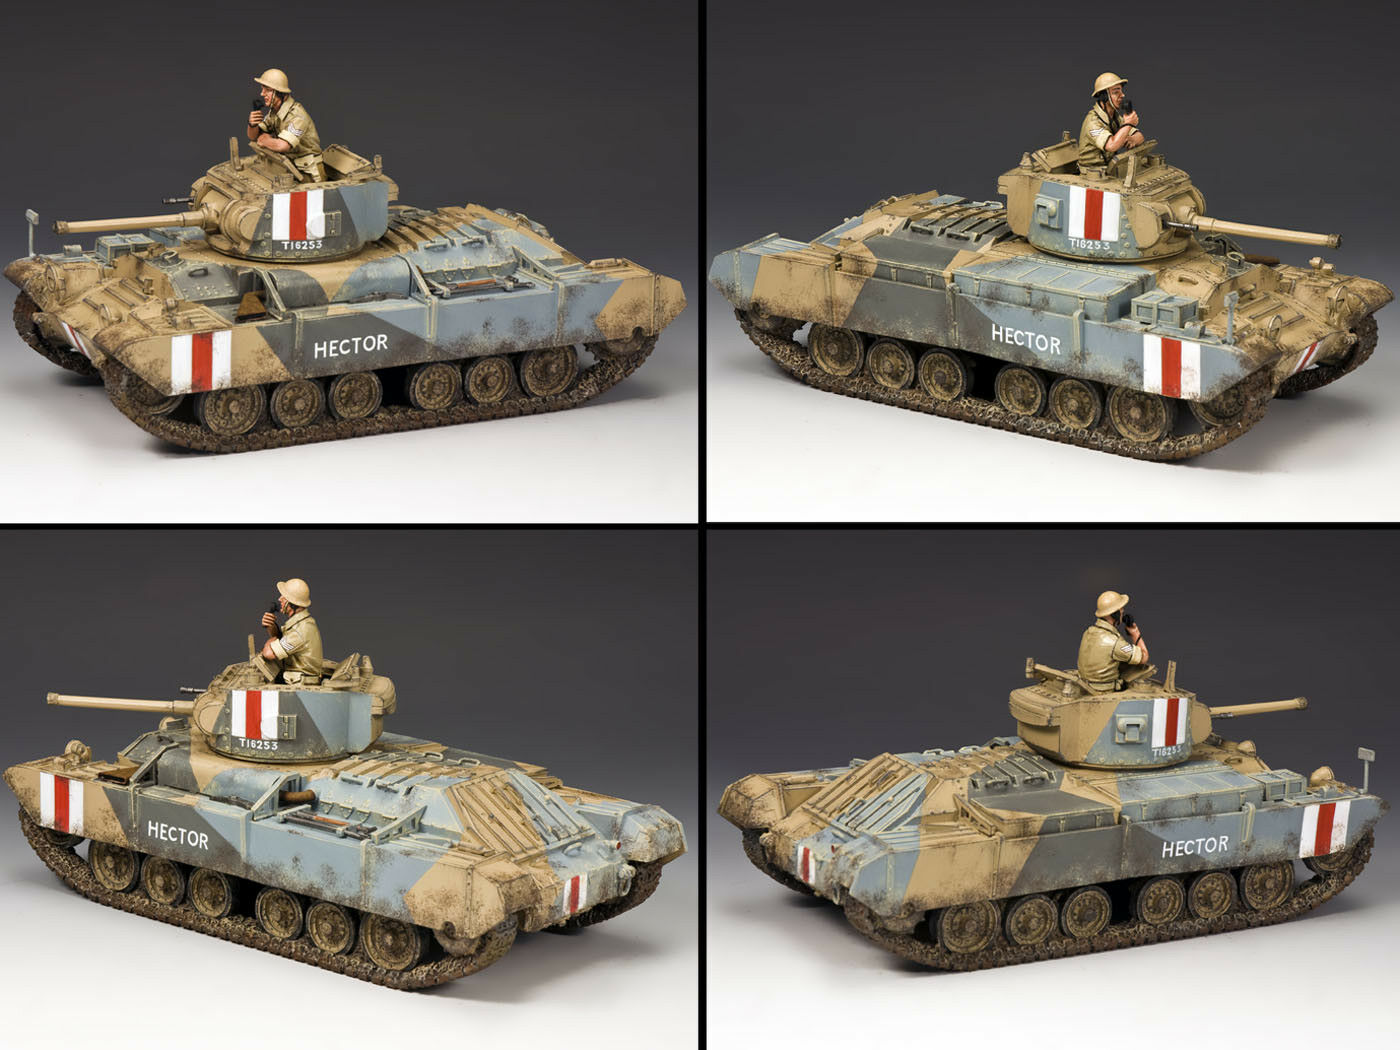 King & Country Octavo Ejército EA078 Valentine Mk III Tanque Set MIB